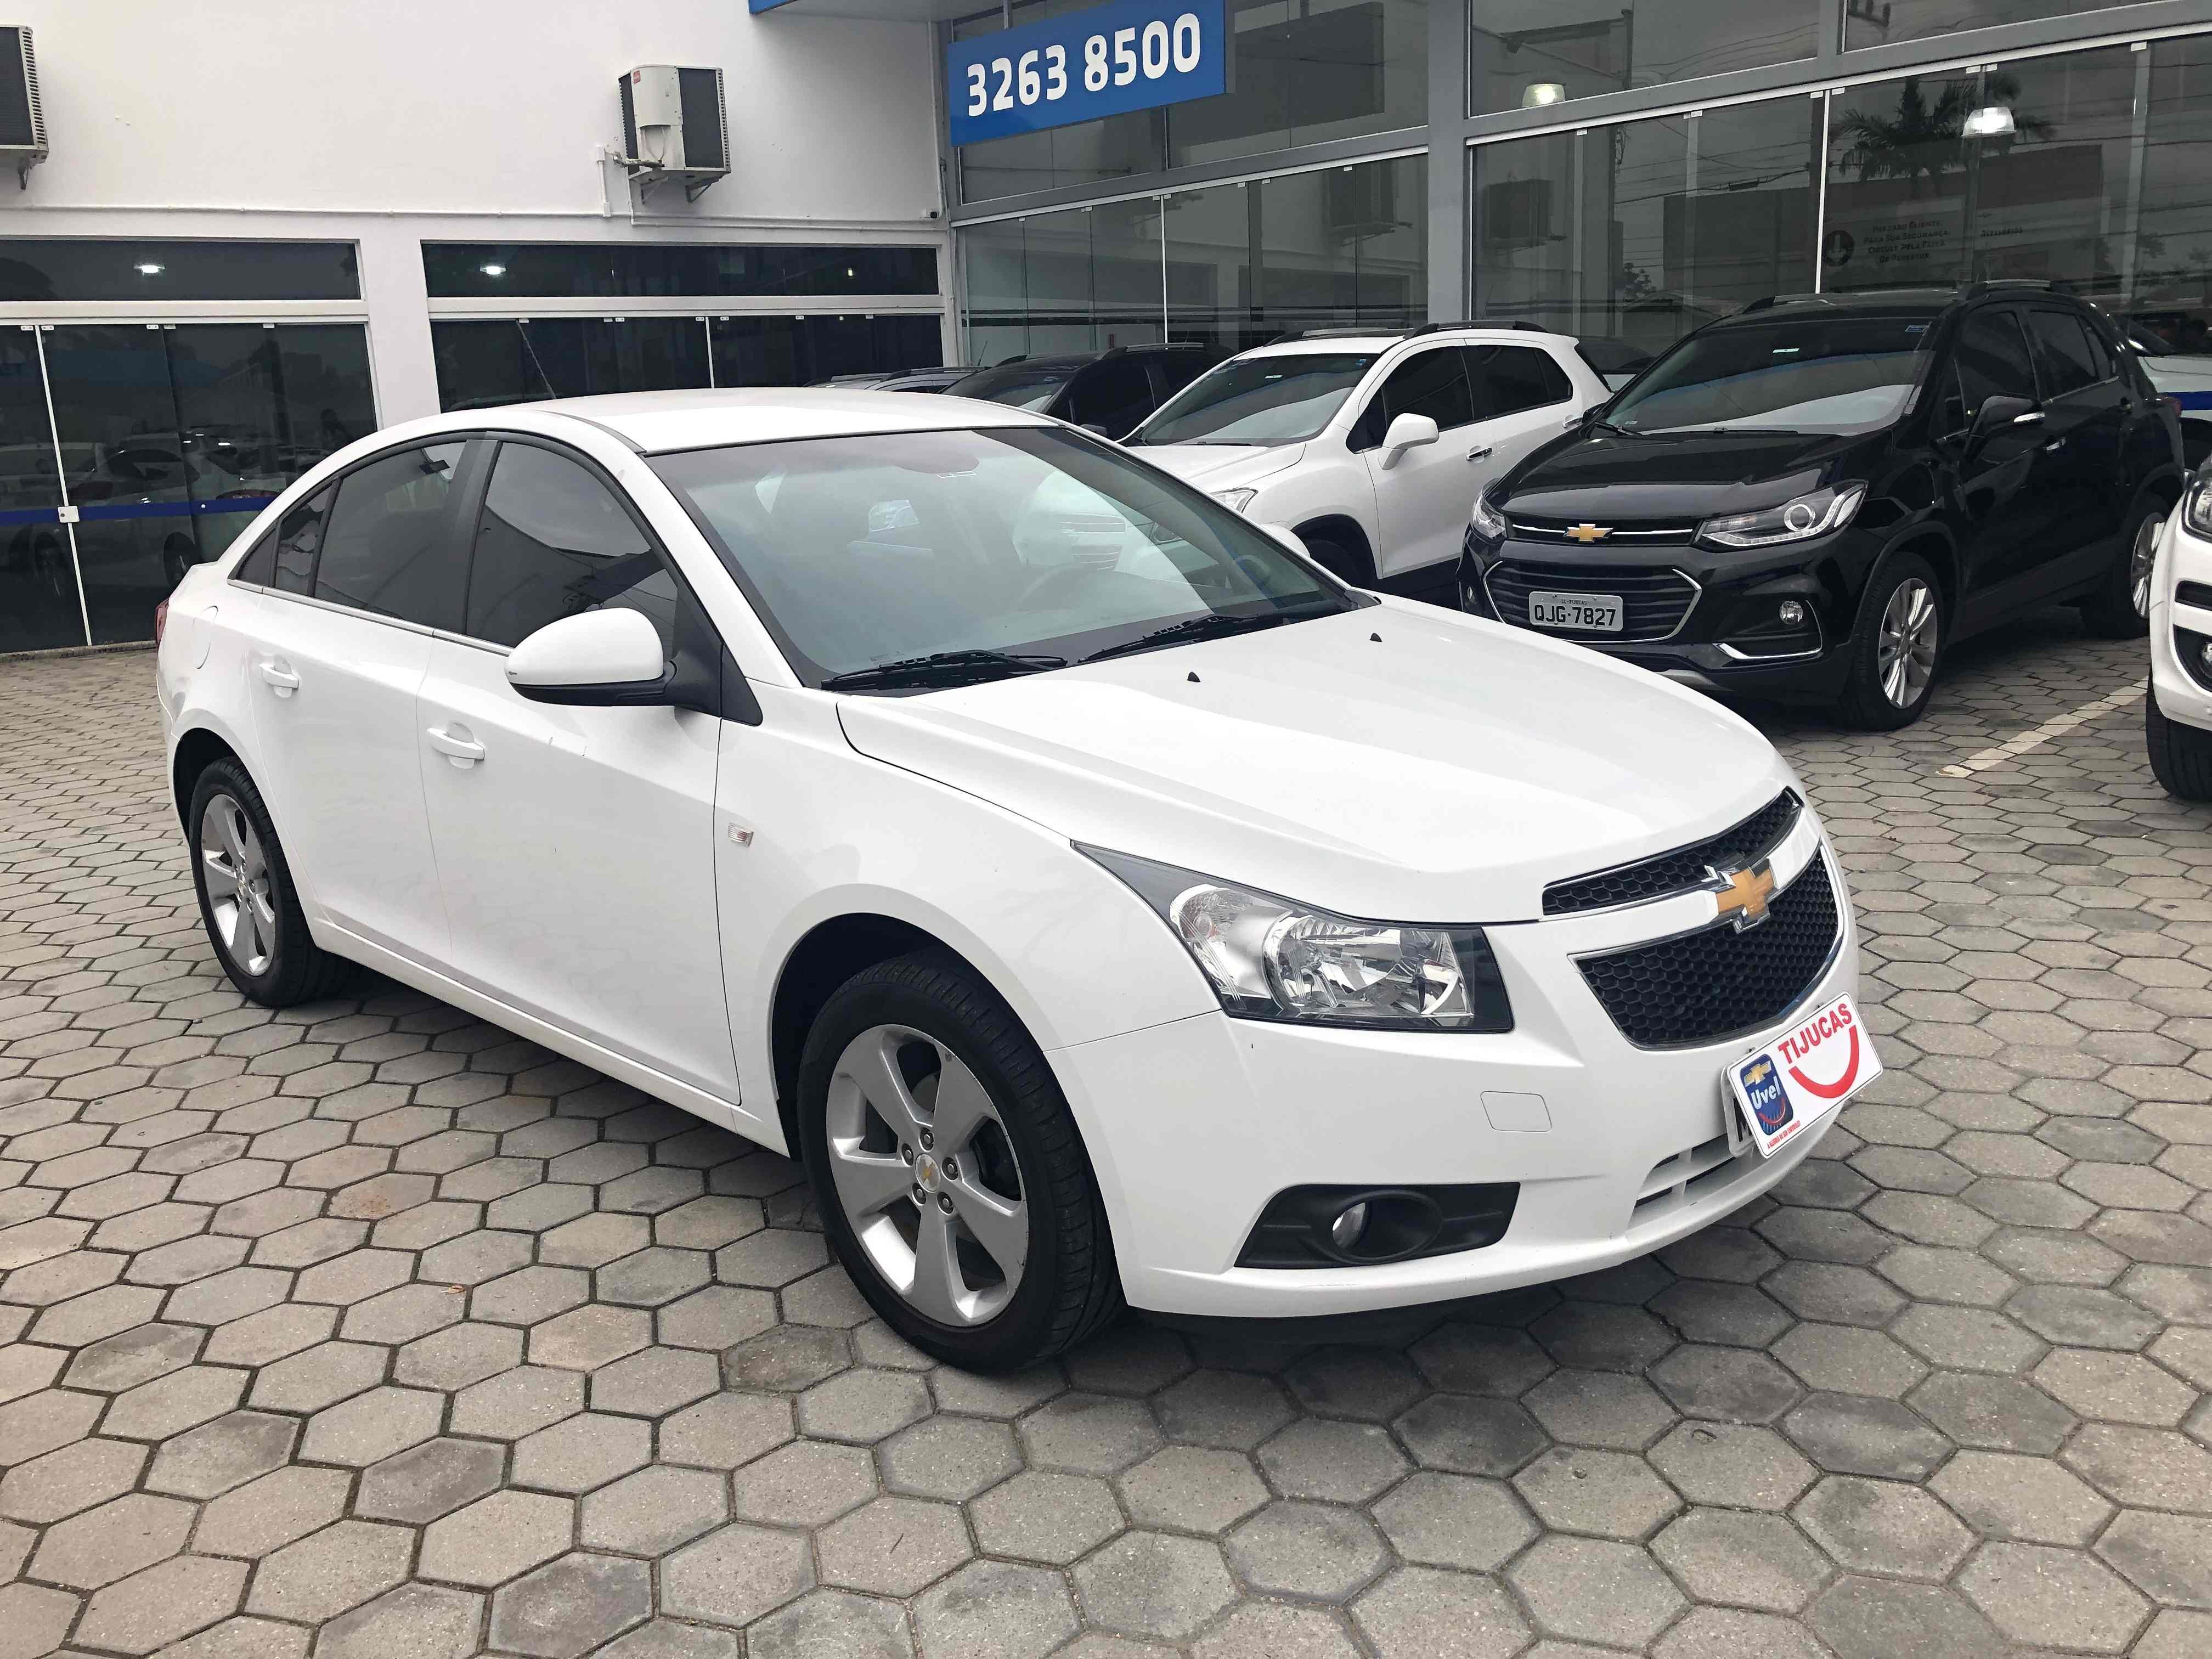 Chevrolet Cruze LT 1.8L 2014